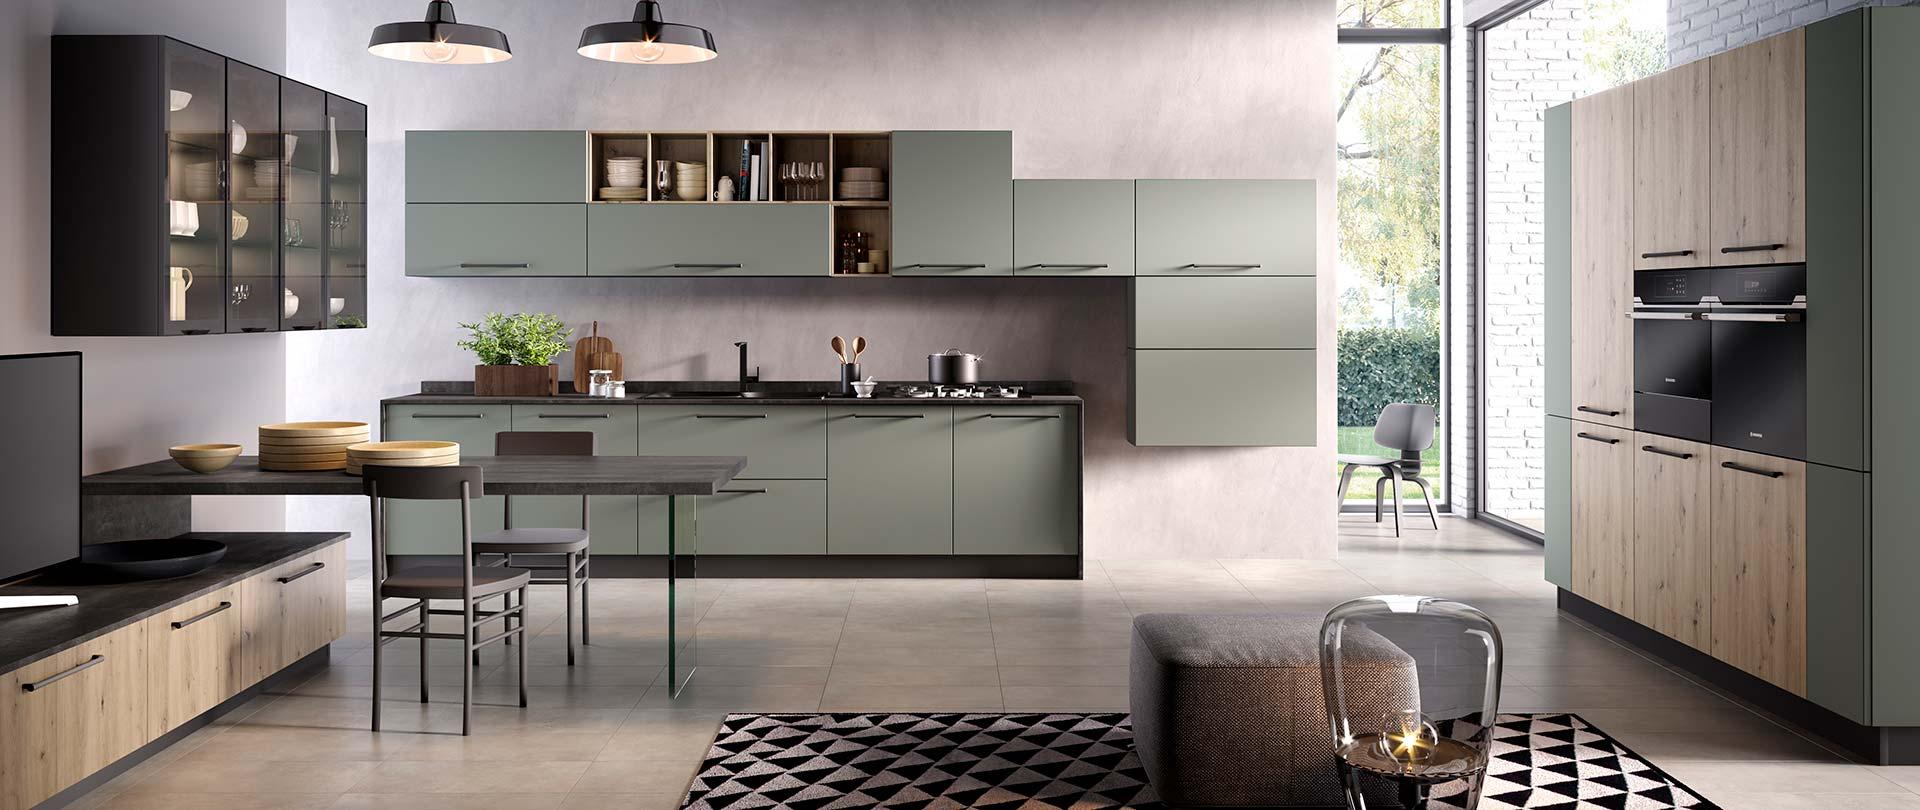 00-evo-cucina-aurora_rovere-nodato-miele-verde-oliva-opaco